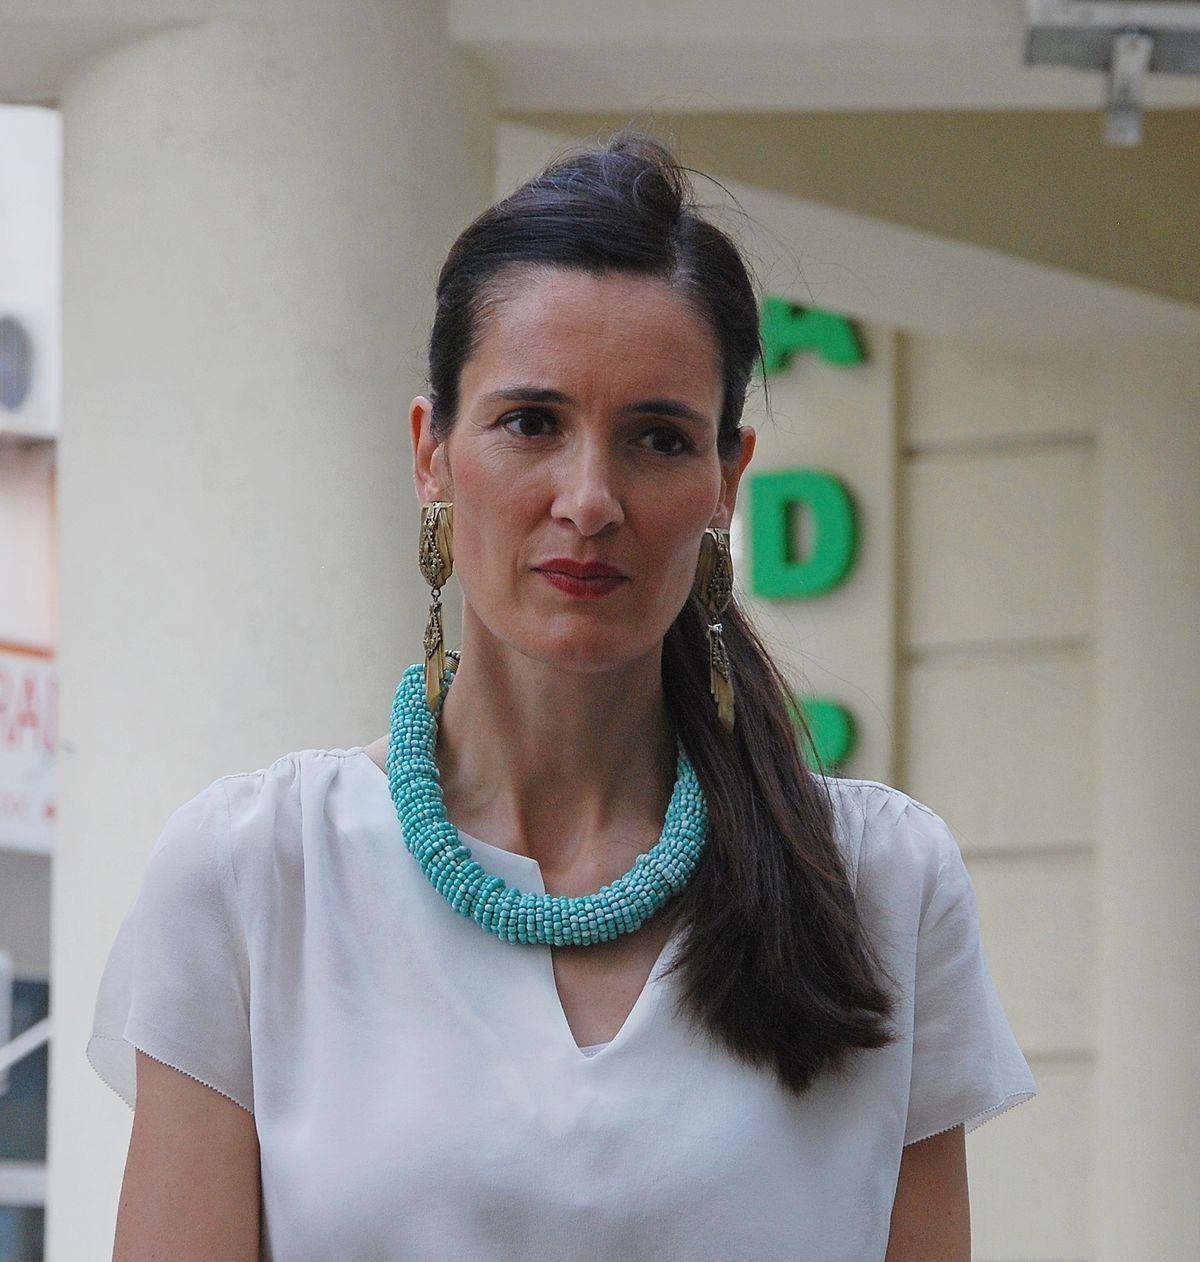 Clotilde Armand running for mayor in Bucharest District 1  |Clotilde Armand